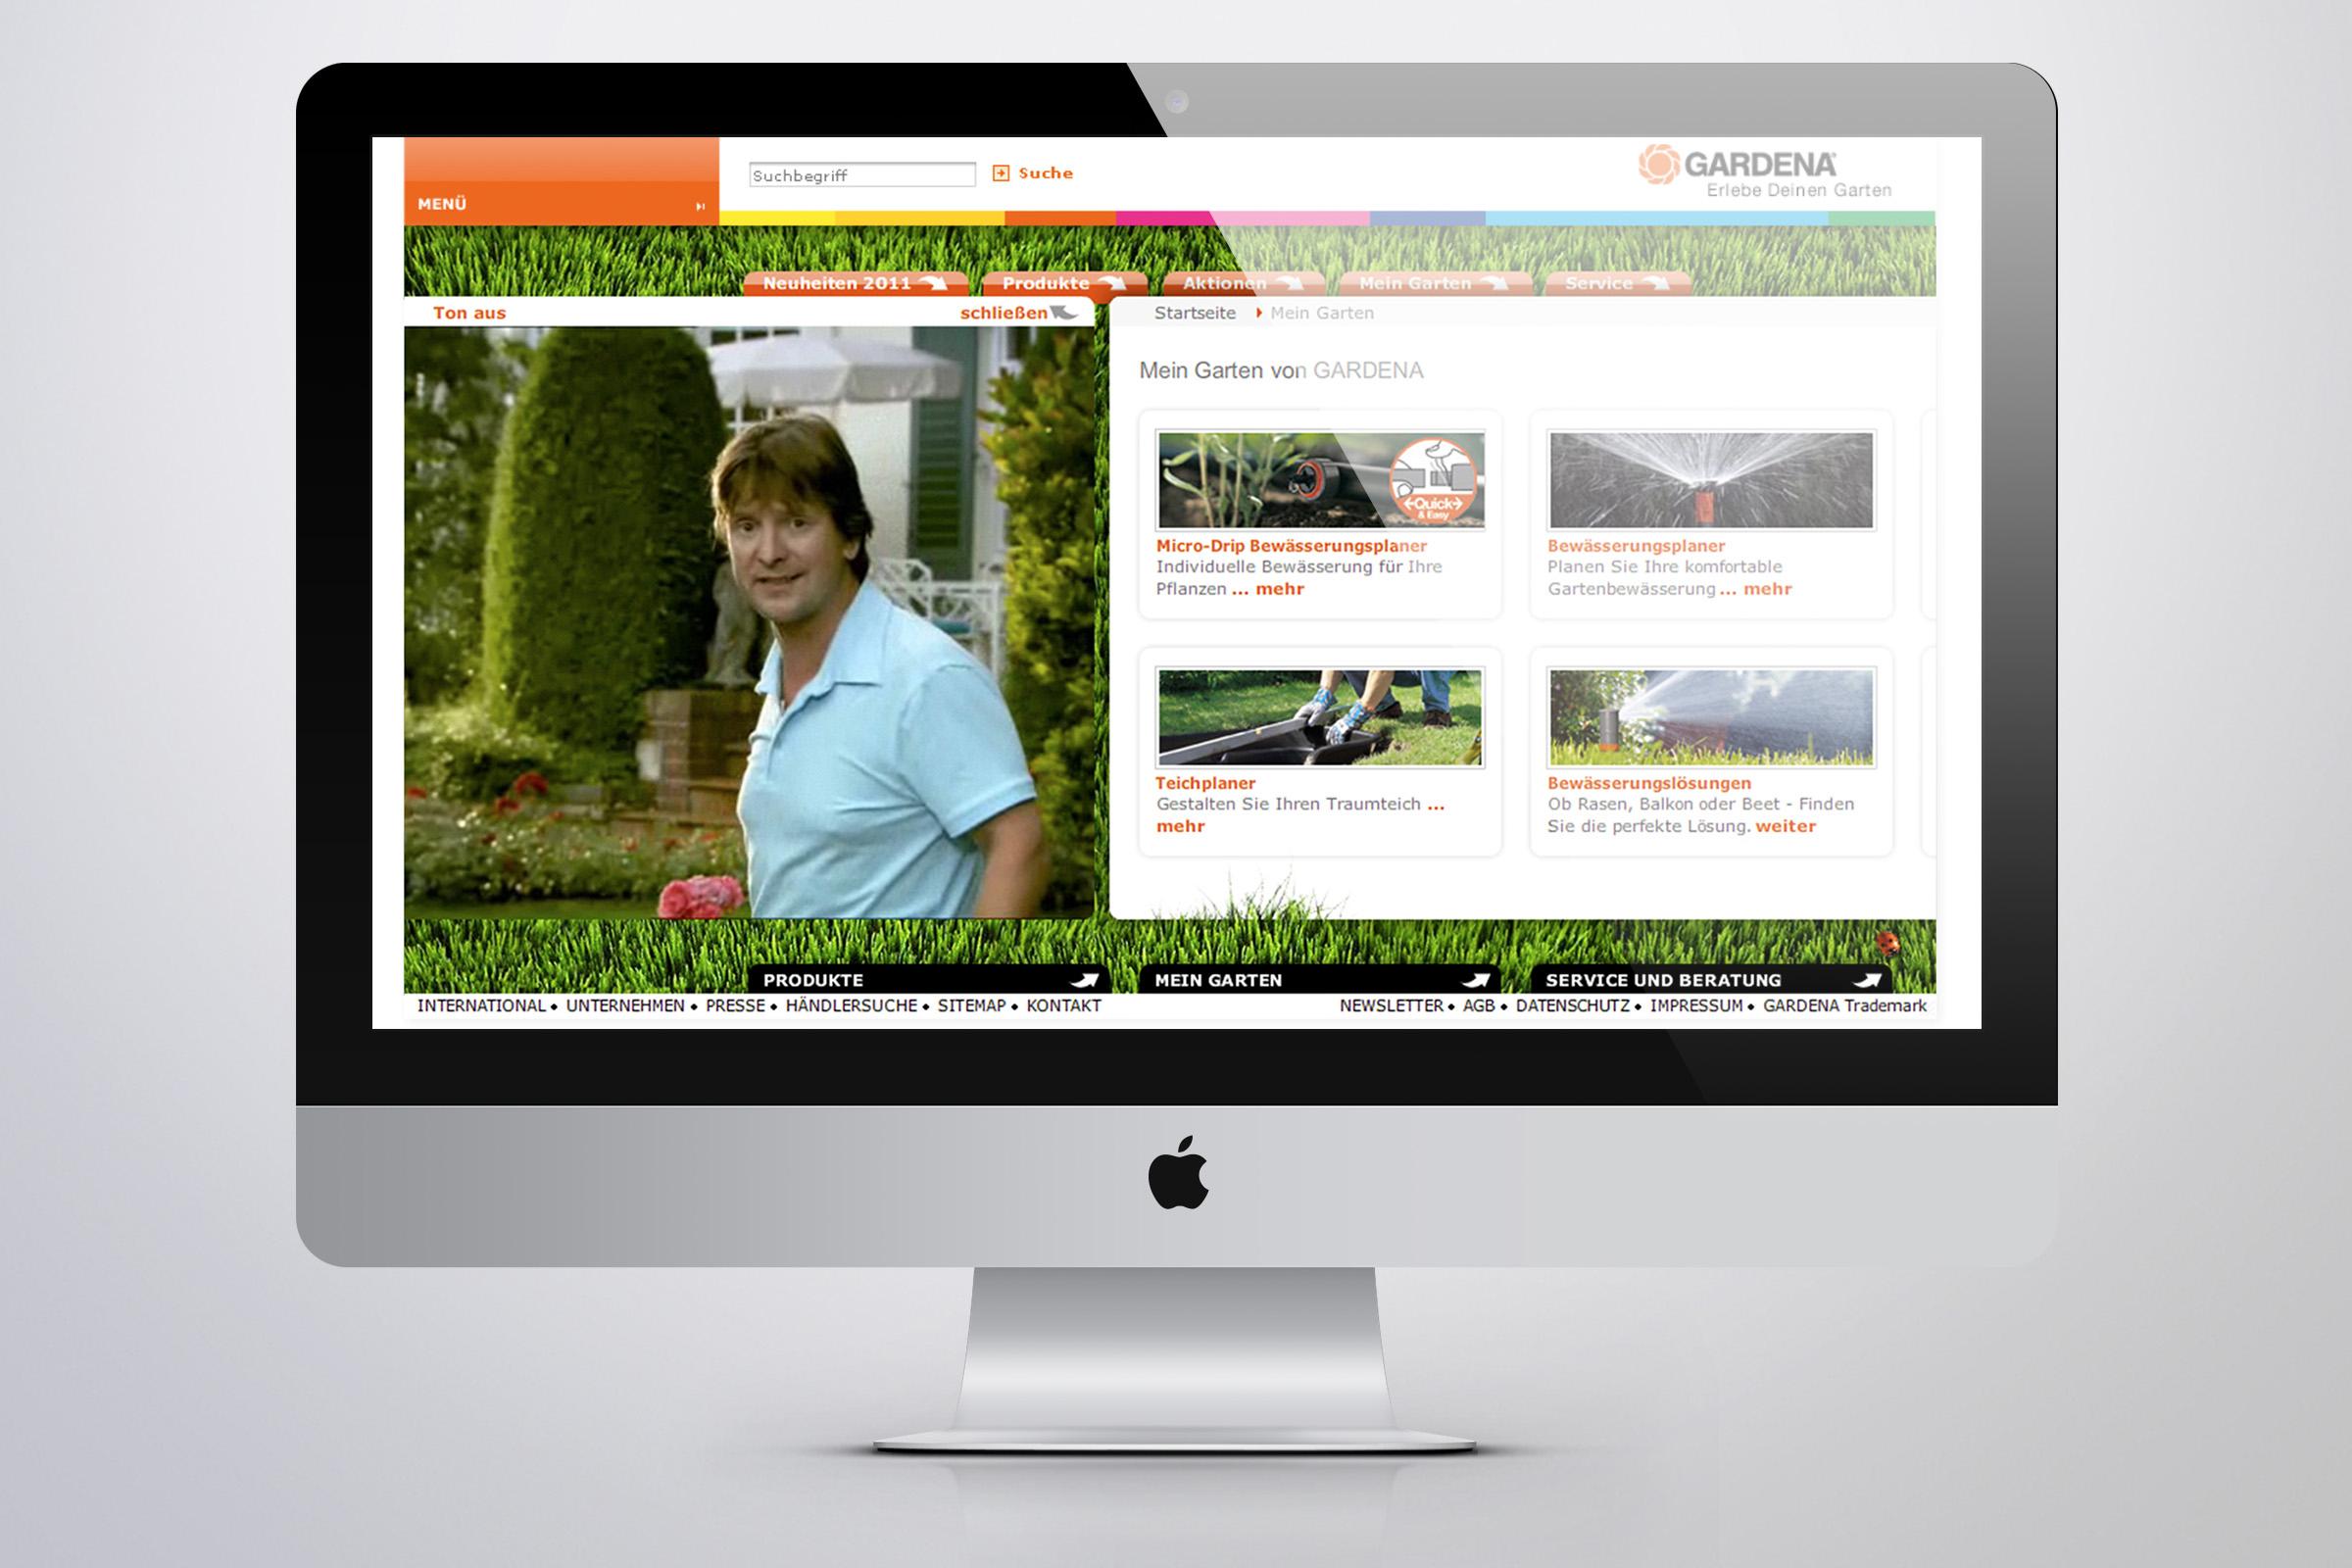 iMac_2400x1600